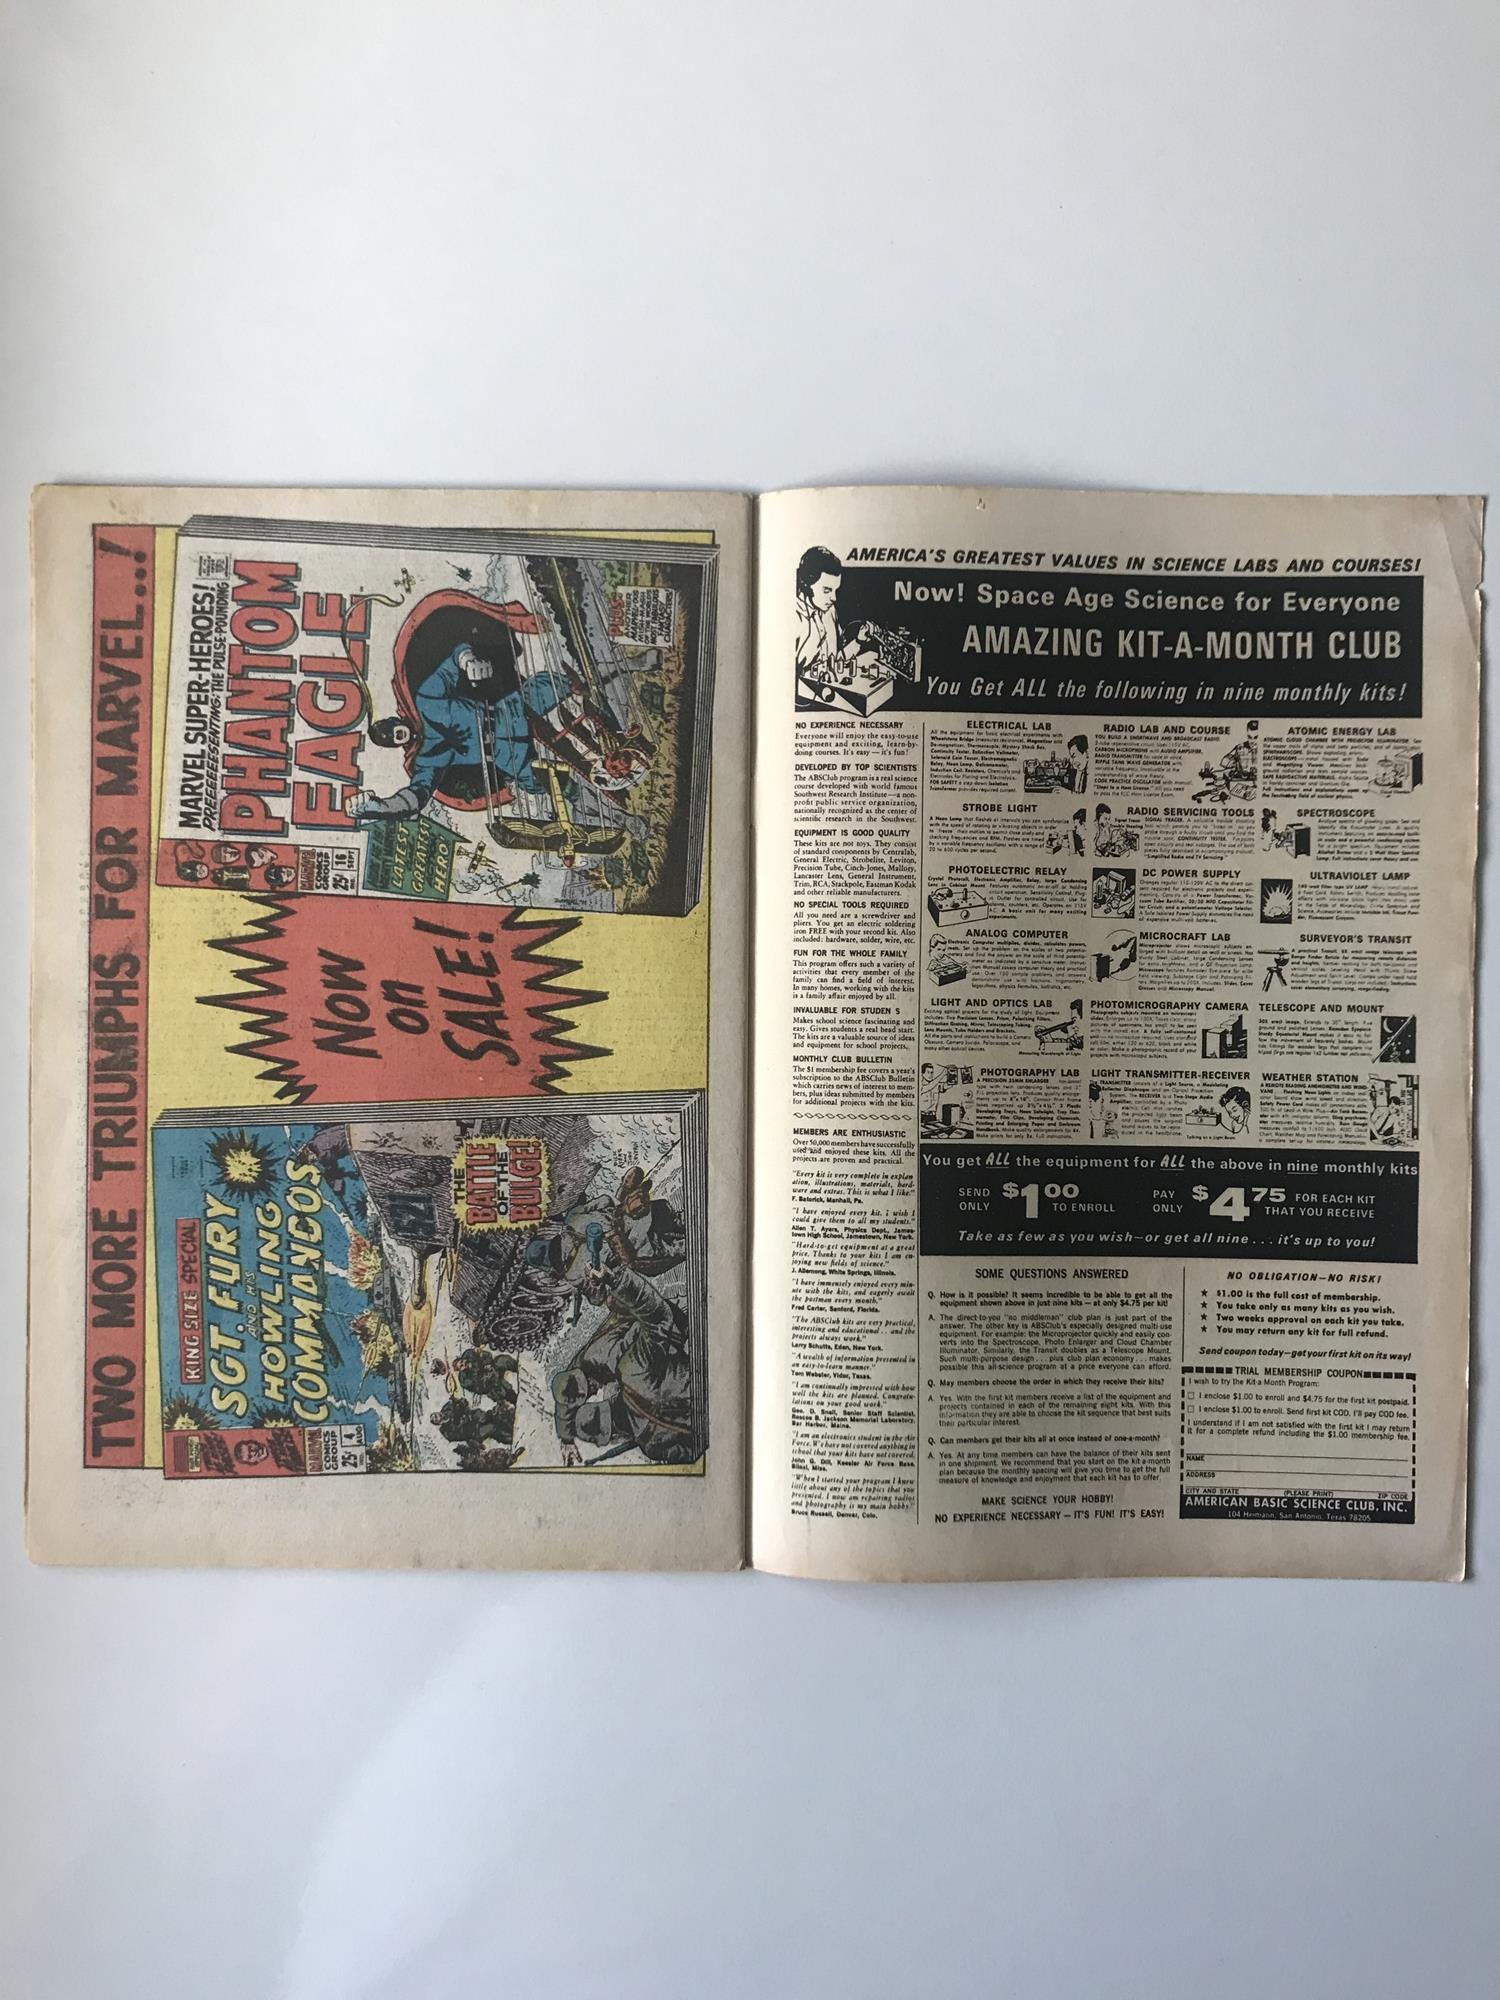 Lot 39 - HULK # 107 (1968 - MARVEL - Cents with Pence Stamp) - Hulk battles Mandarin + Nick Fury and S.H.I.